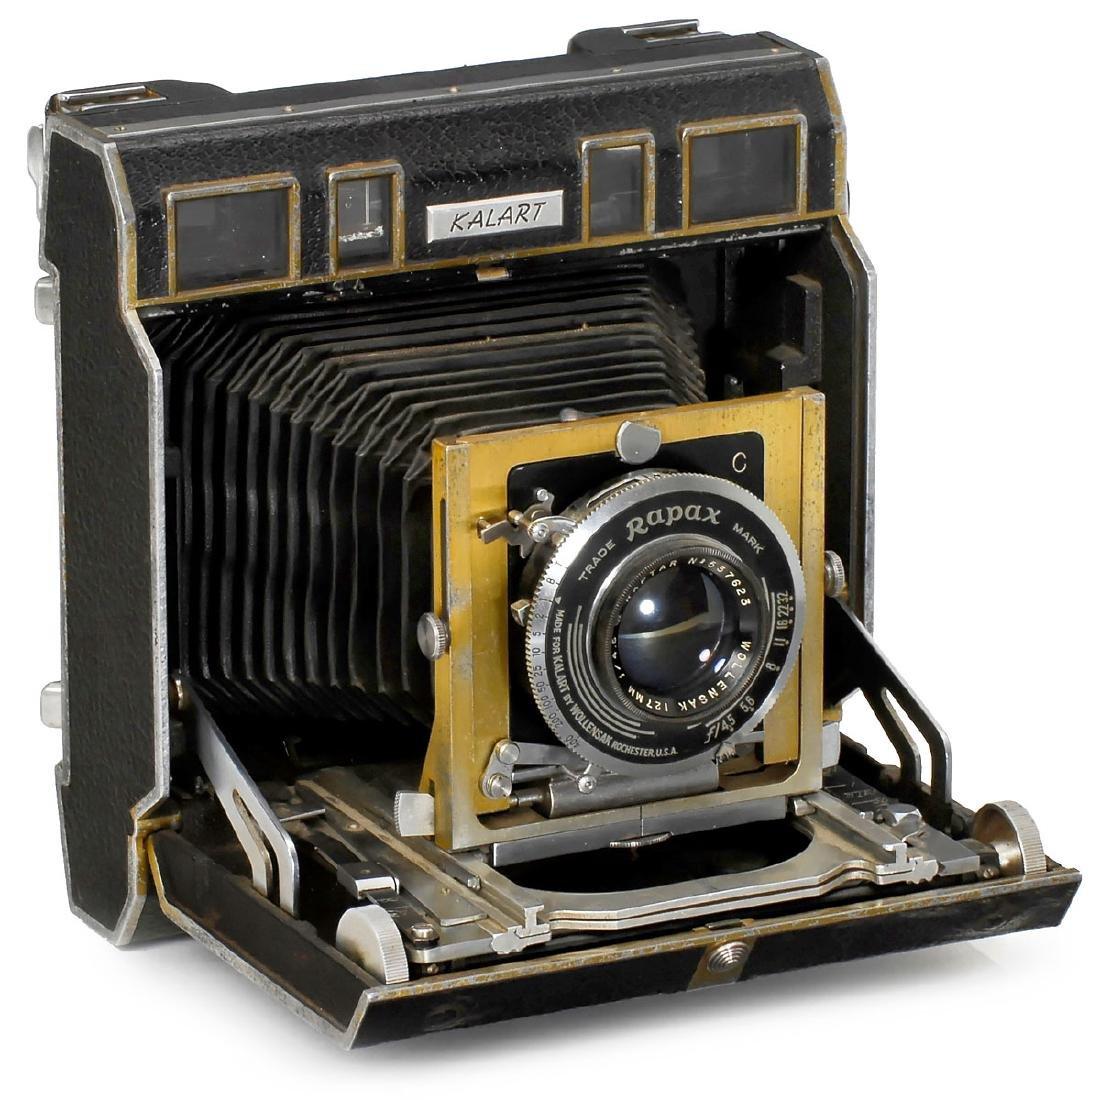 Kalart Press-Camera, 1948